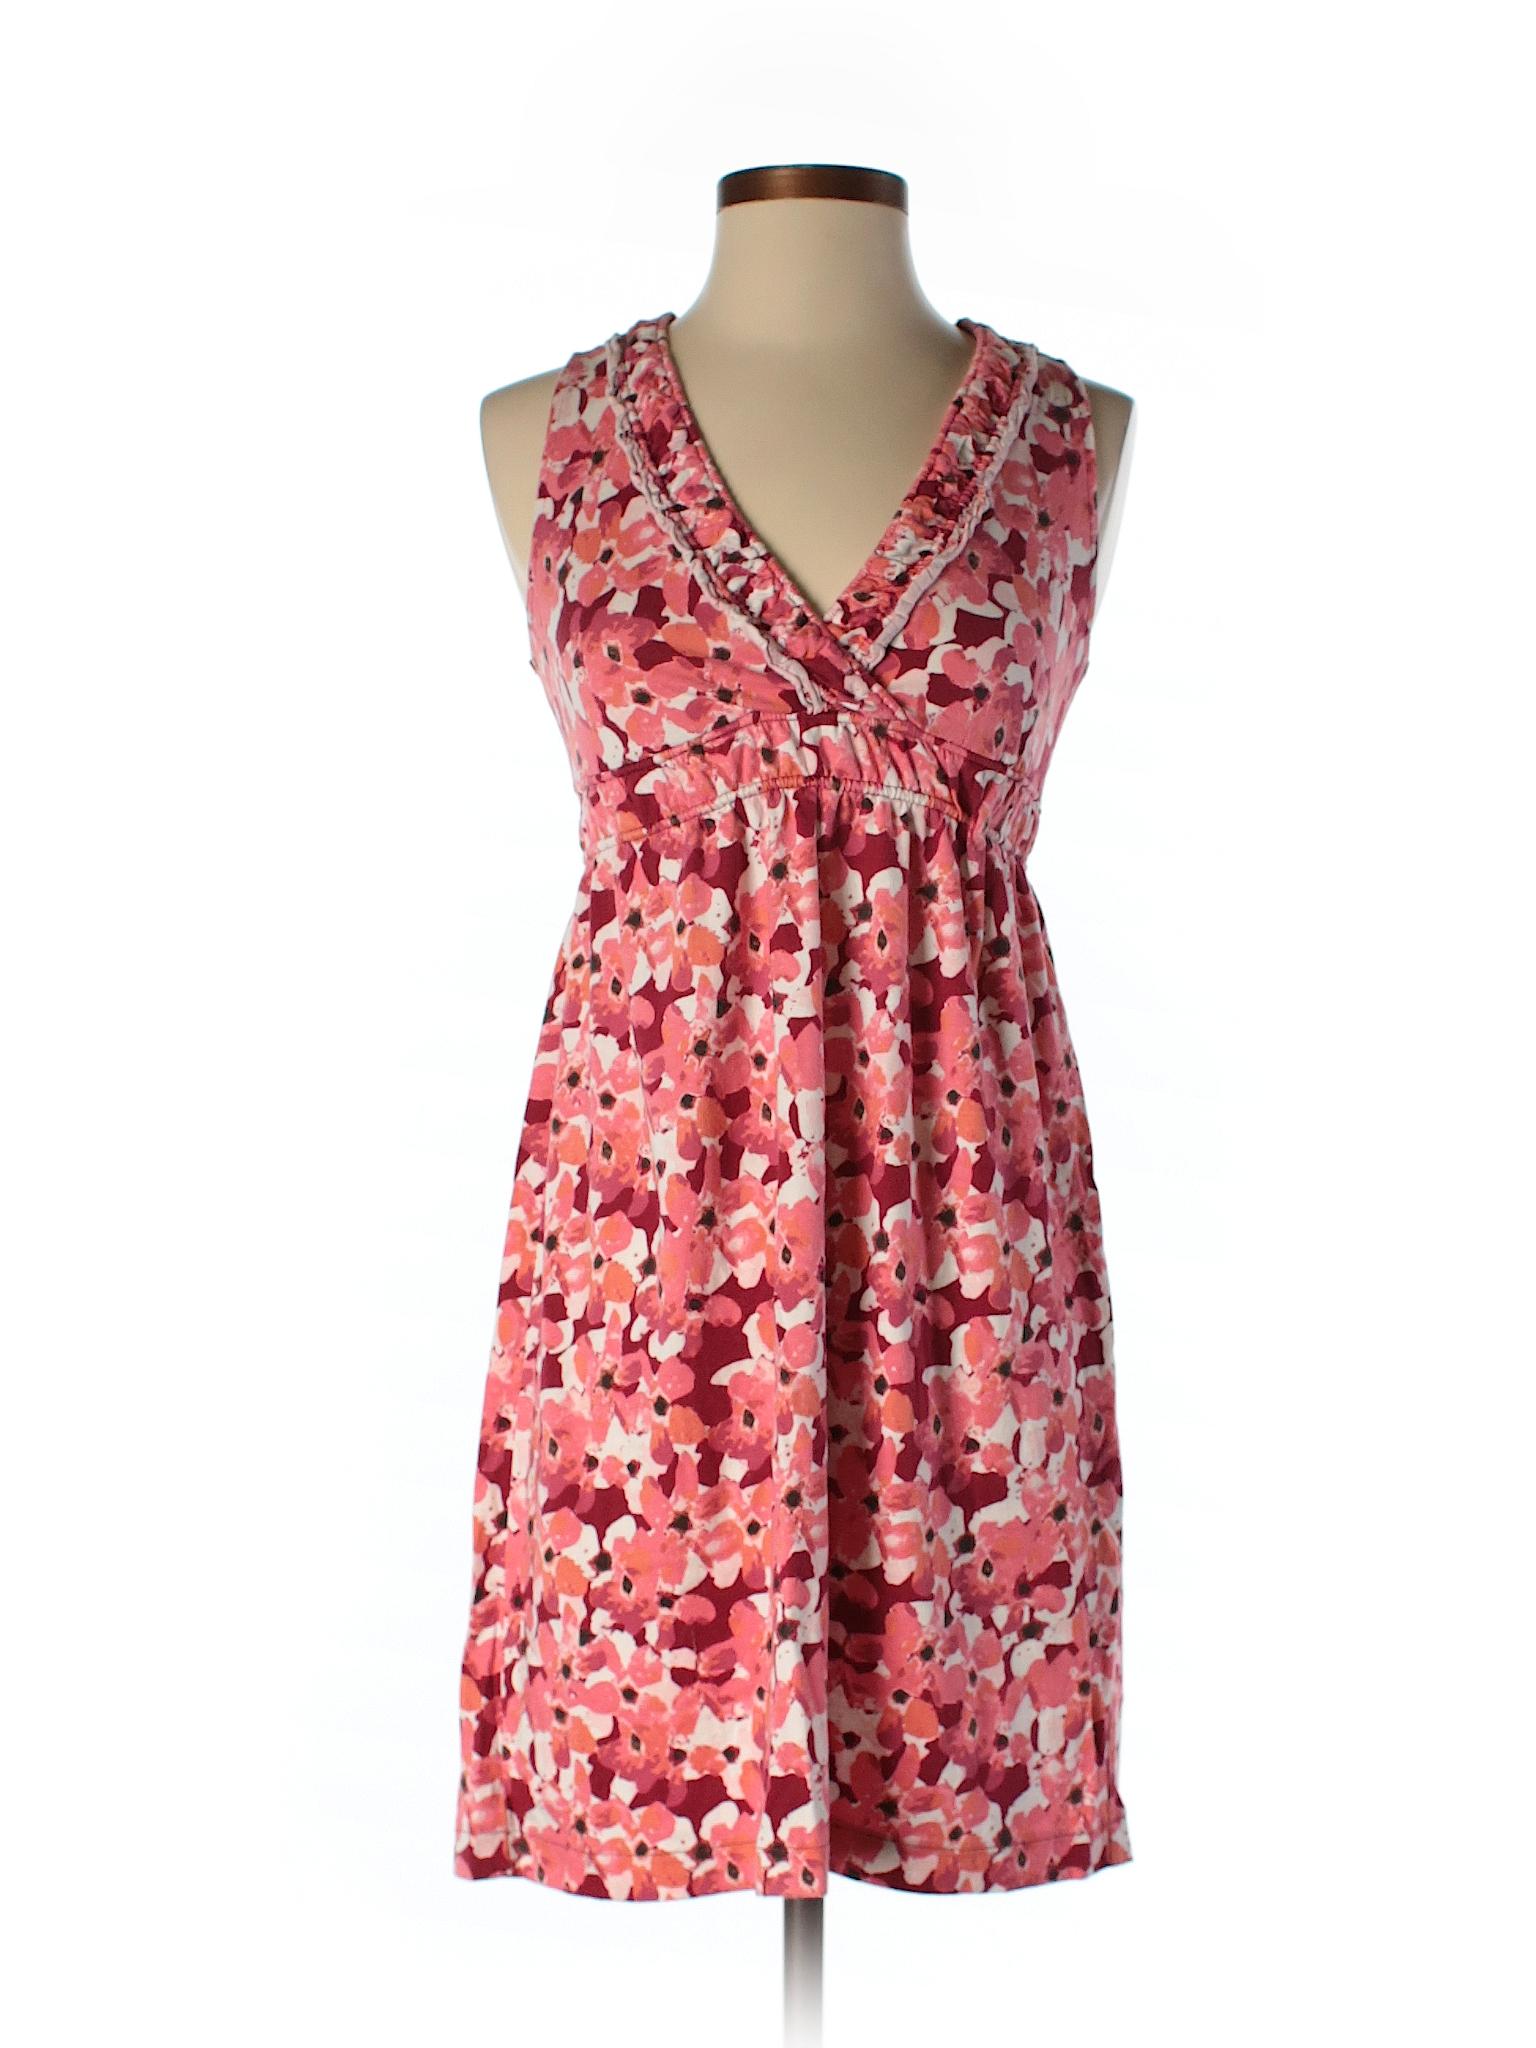 Ann Taylor Loft Outlet Print Pink Casual Dress Size Xs 63 Off Thredup